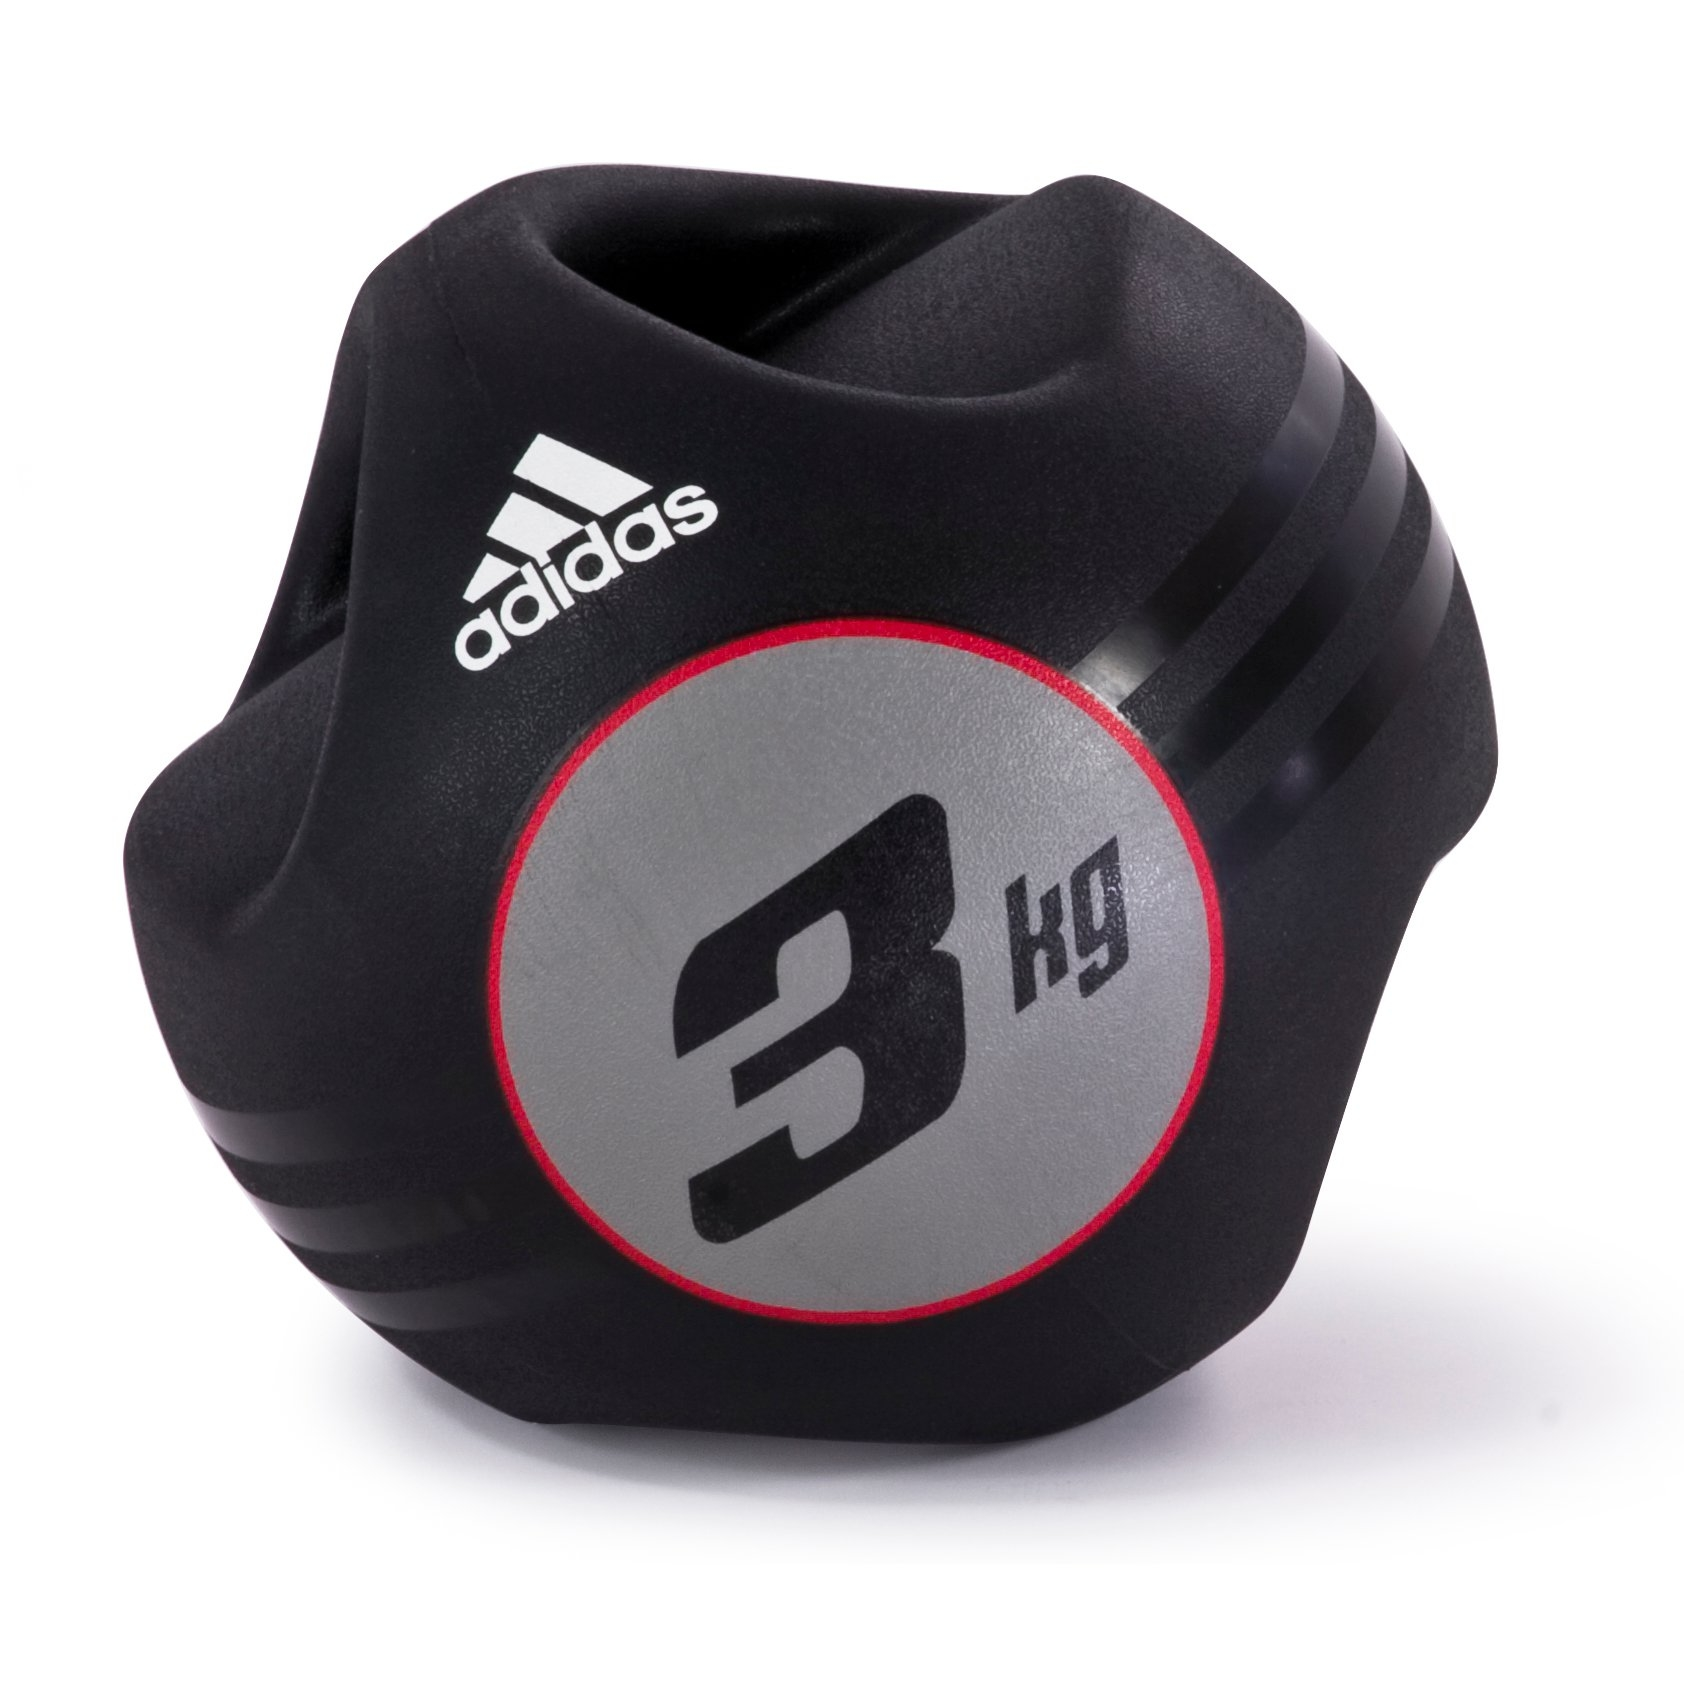 Adidas Dual Grip Medicine Ball  3kg